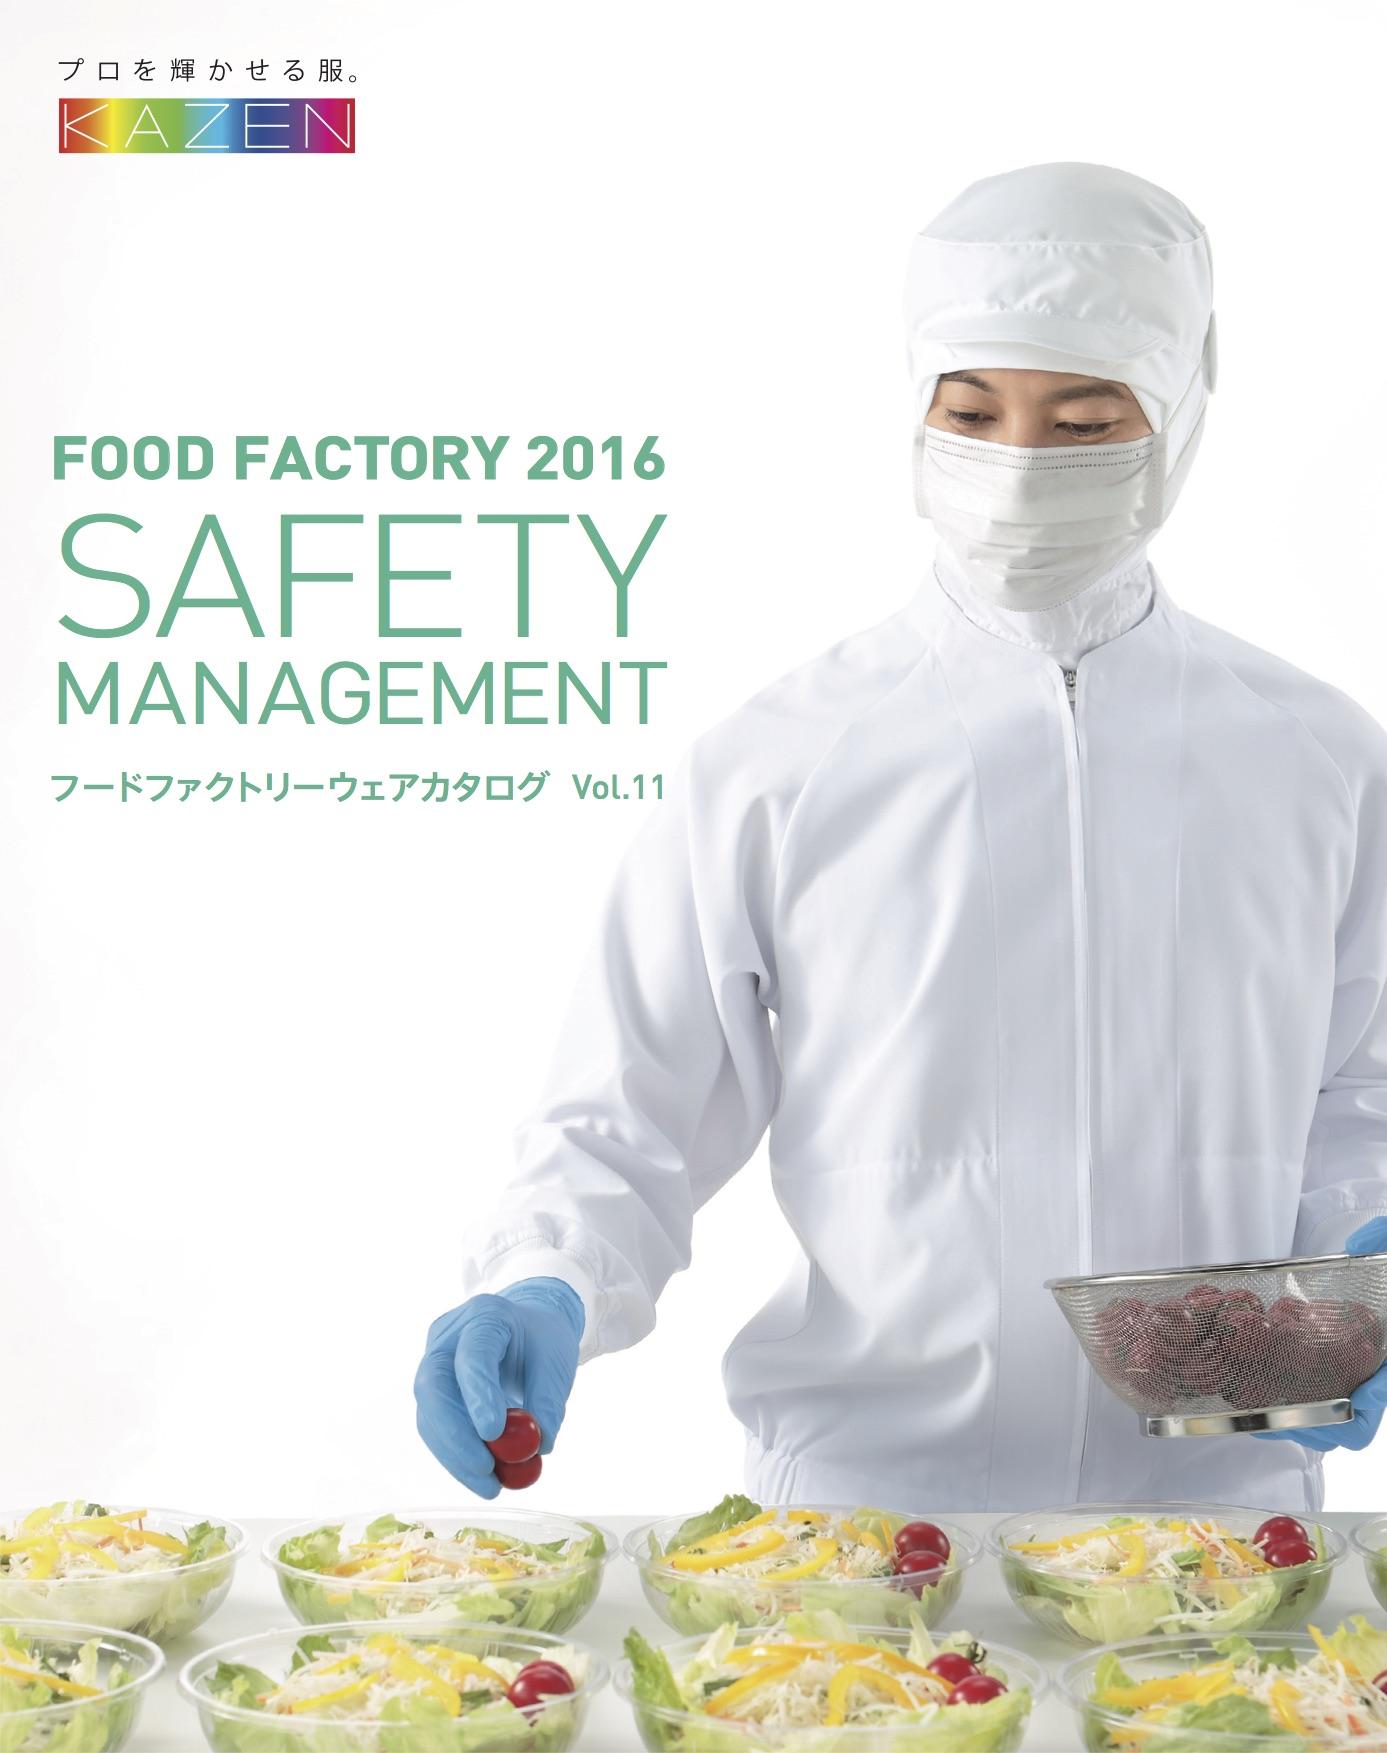 KAZEN FOOD FACTORY 2016